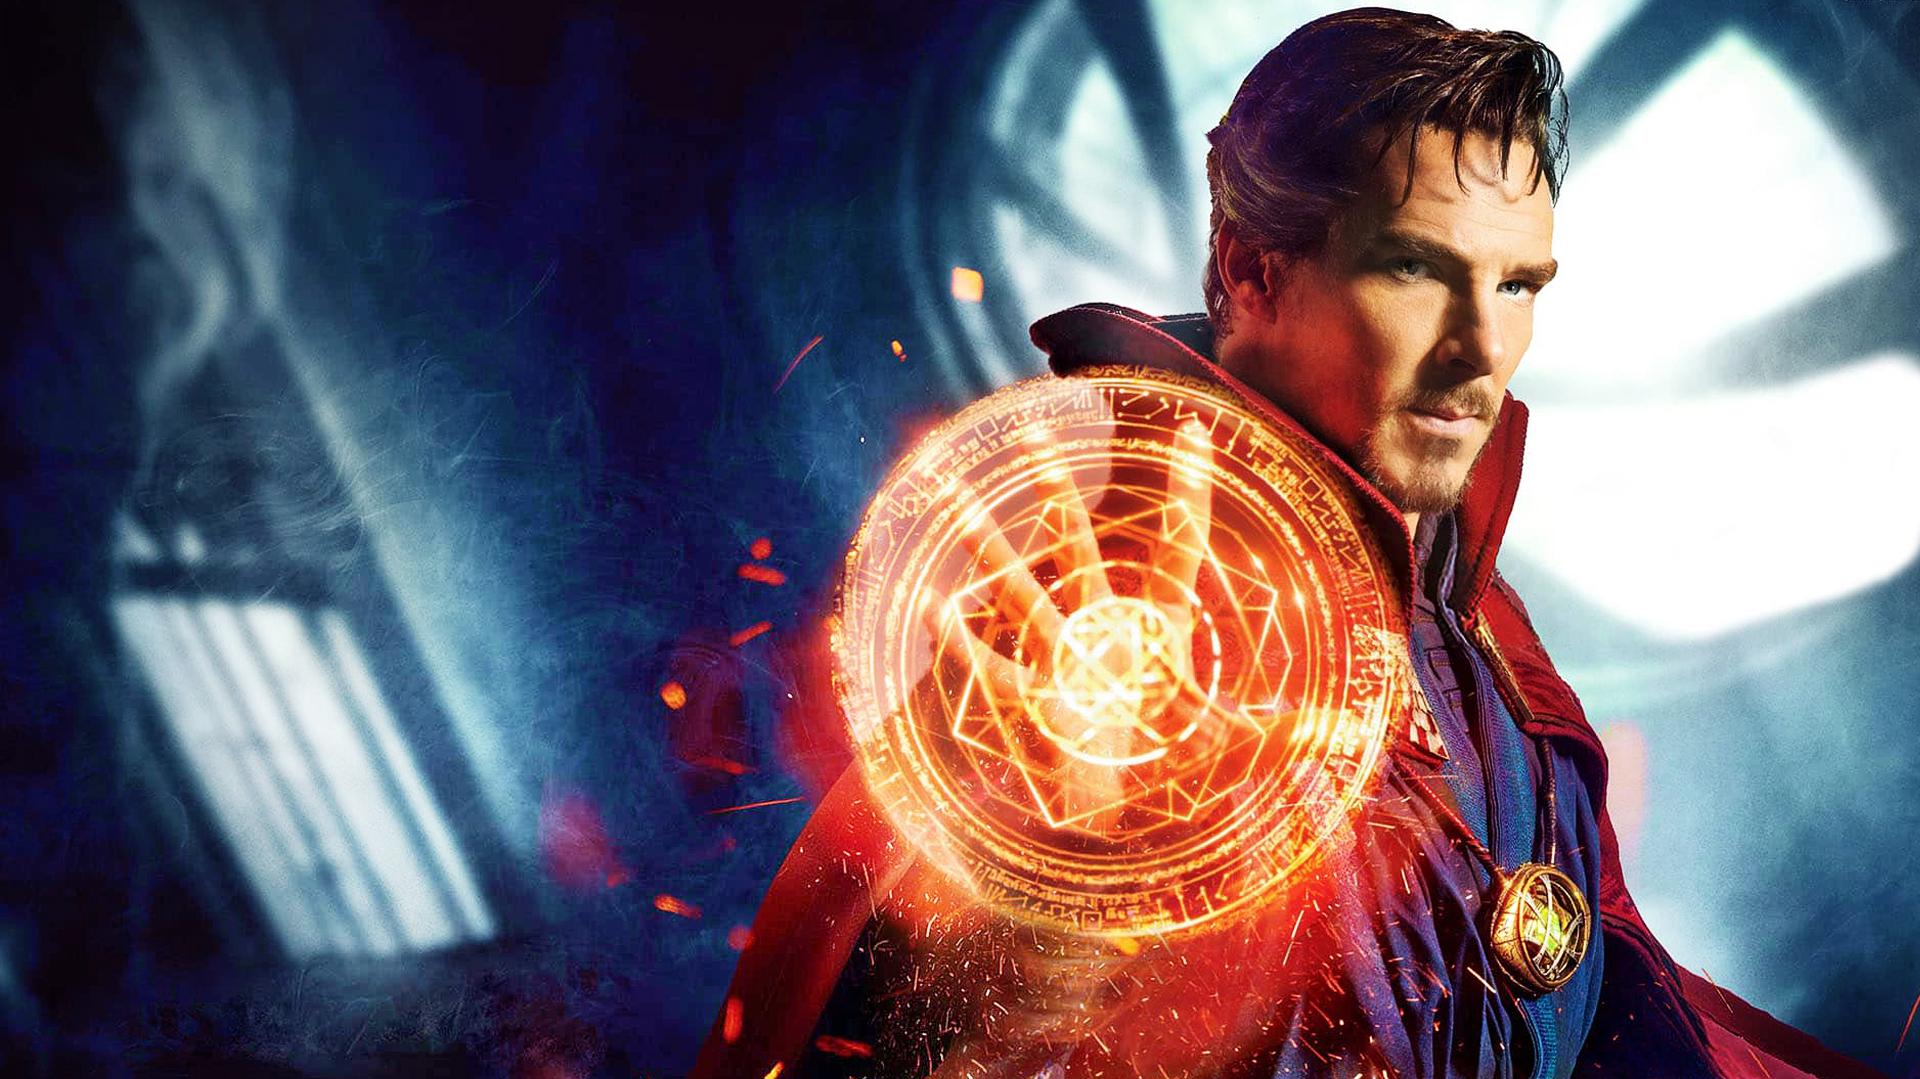 Marvel announces Doctor Strange 2 for 2021 at SDCC